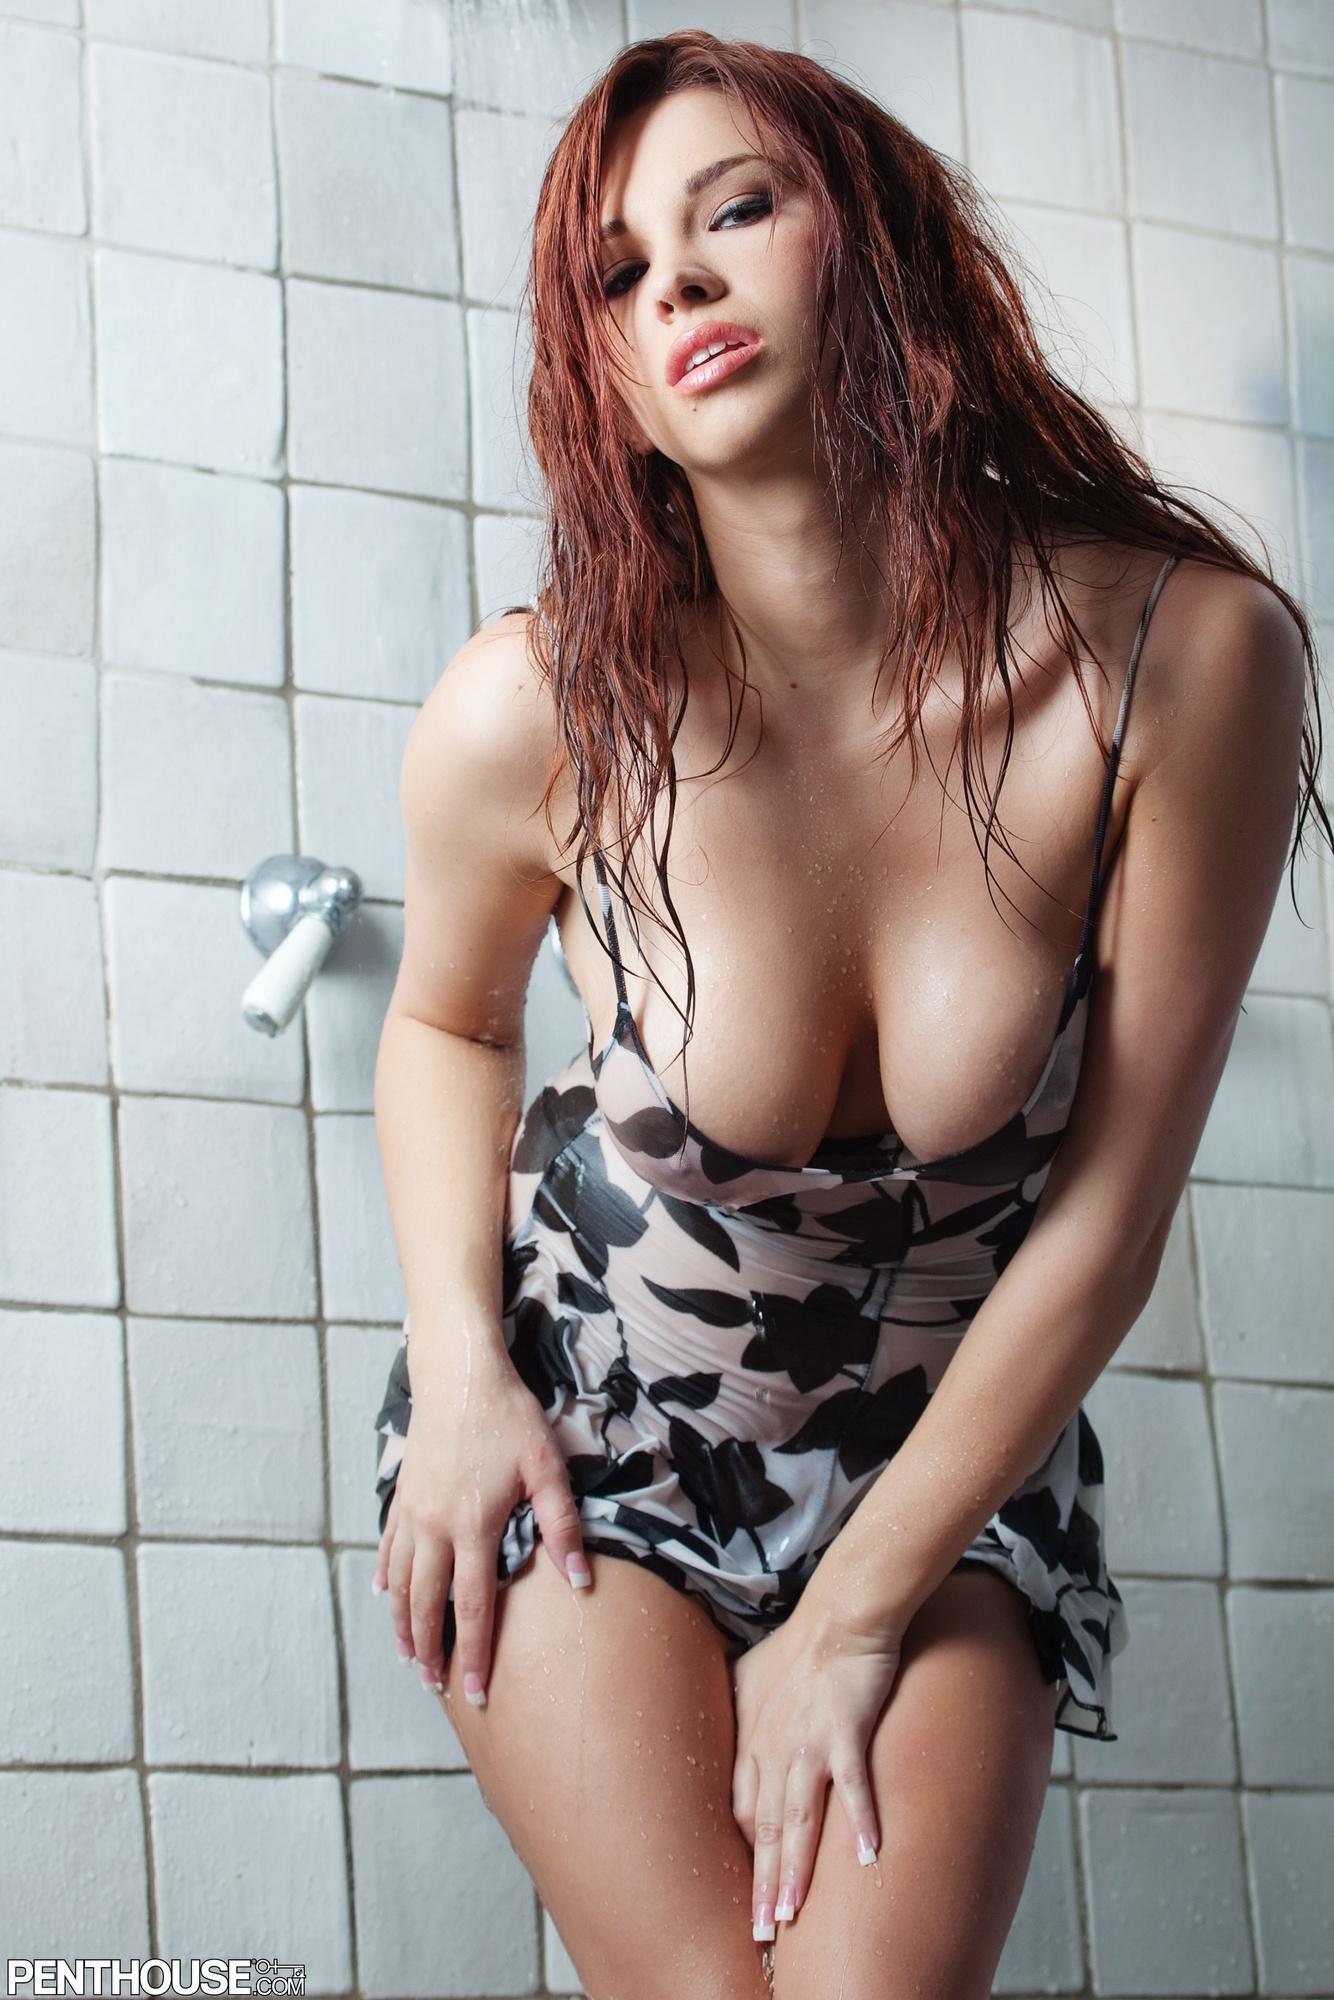 sabrina-maree-shower-wet-tits-naked-penthouse-23